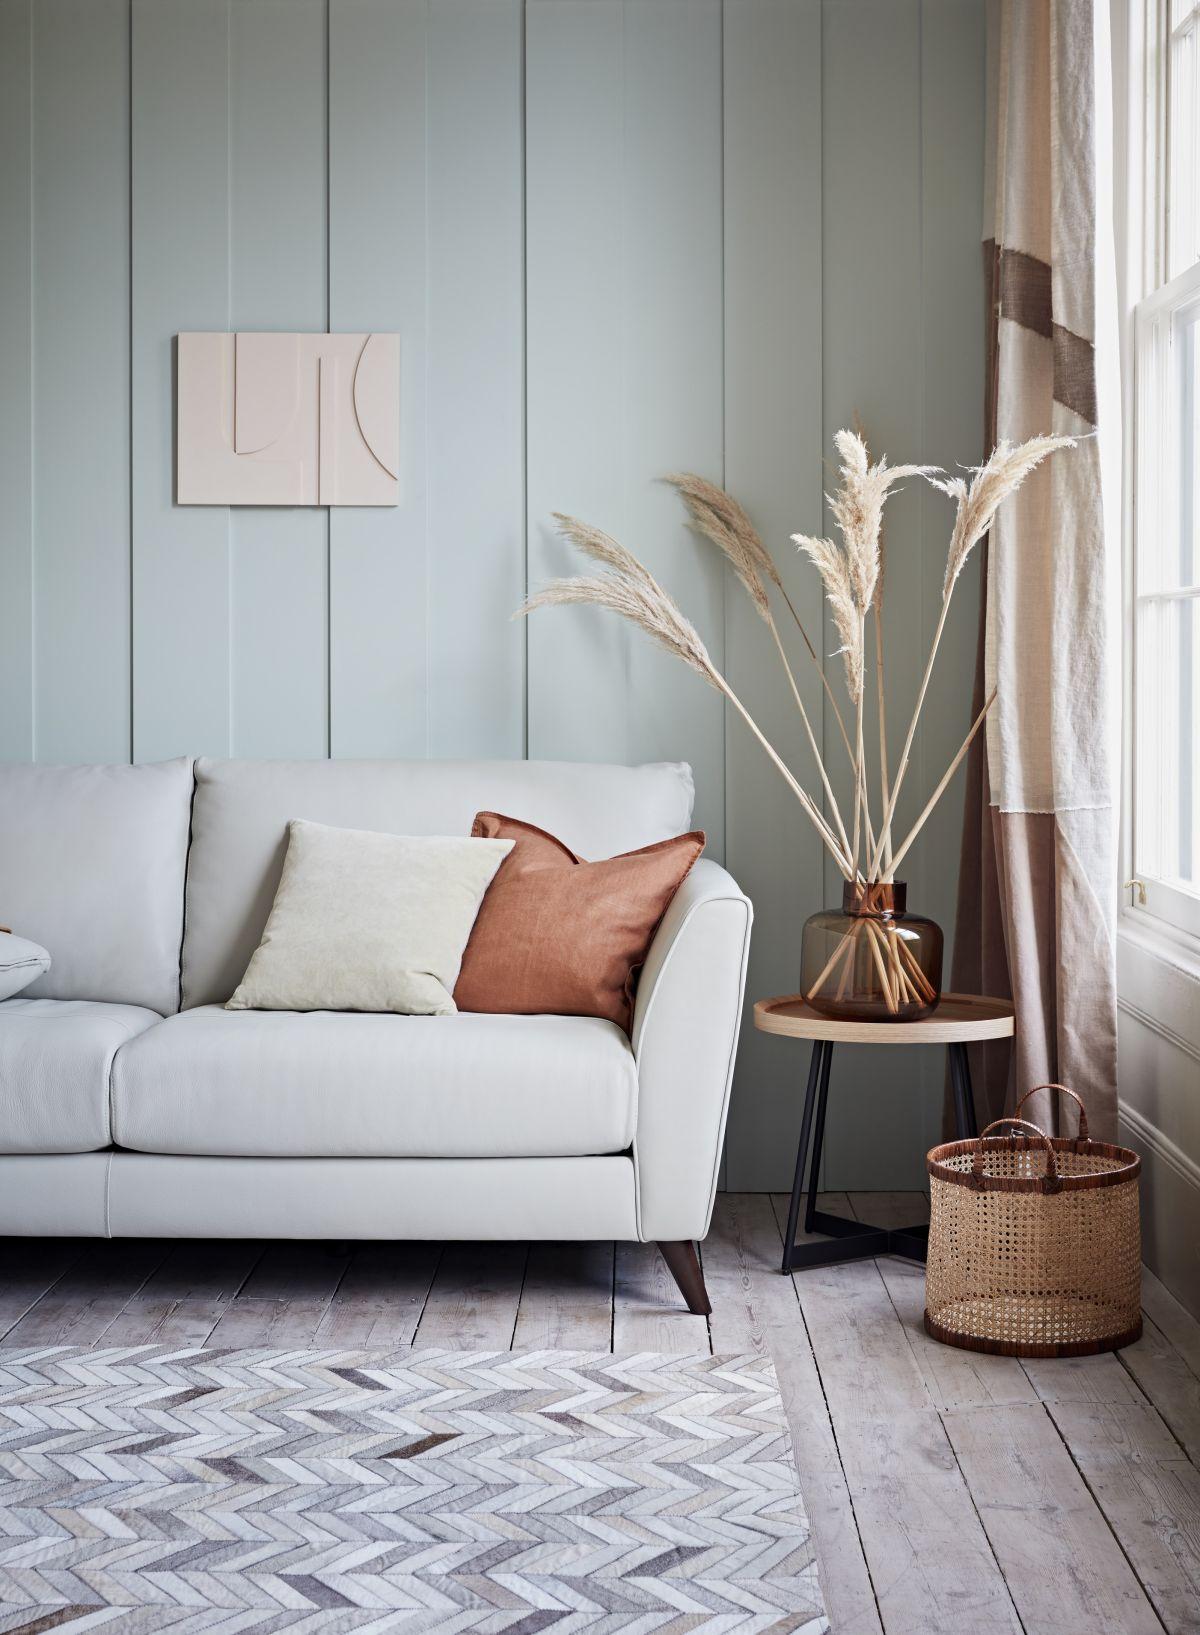 Furniture Village just revealed their 2020 interior trends...